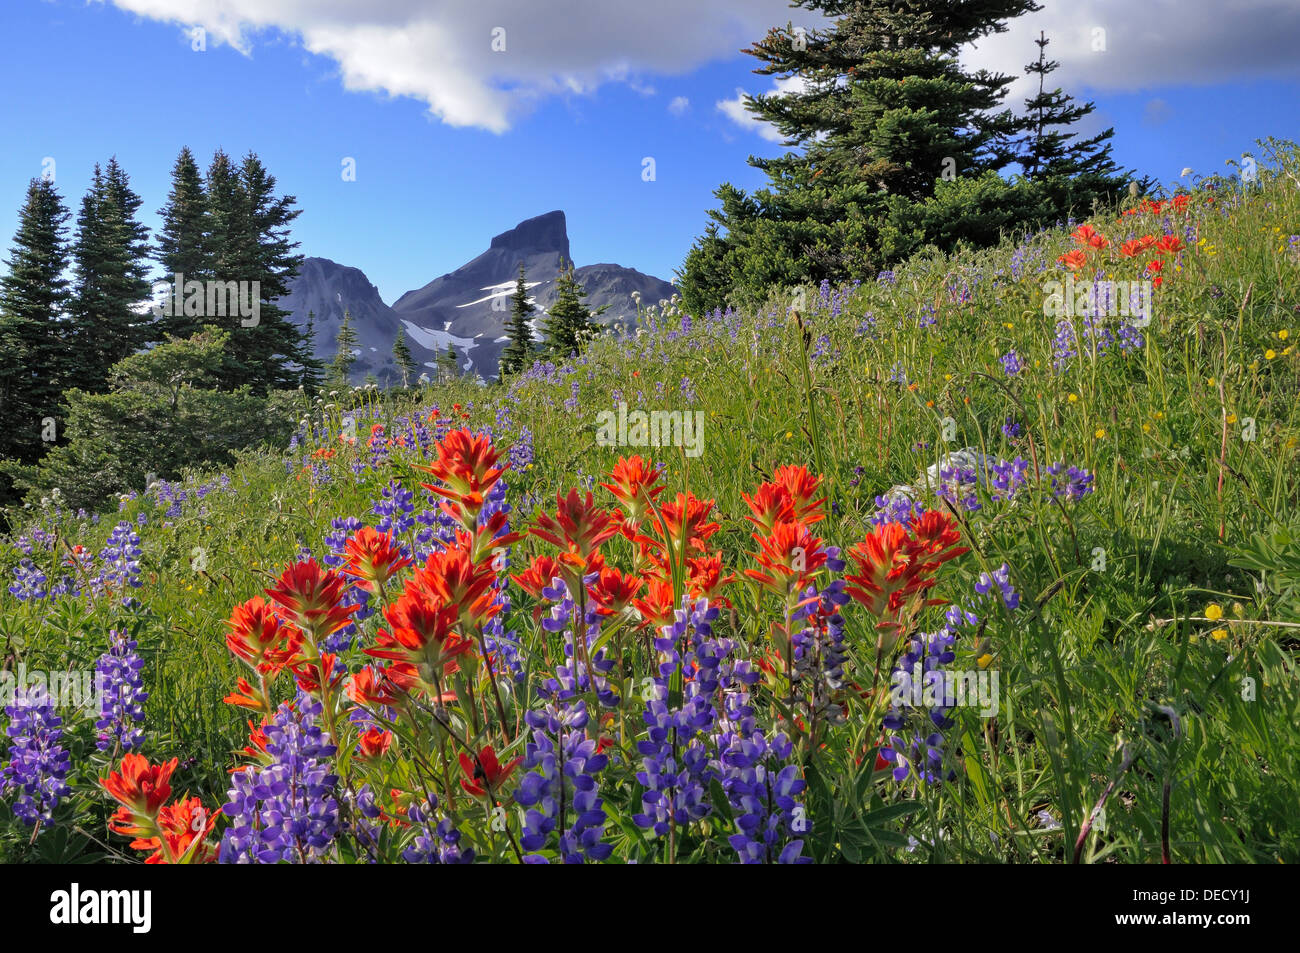 Black Tusk, wildflowers, Garibaldi Provincial Park, British Columbia, Canada - Stock Image